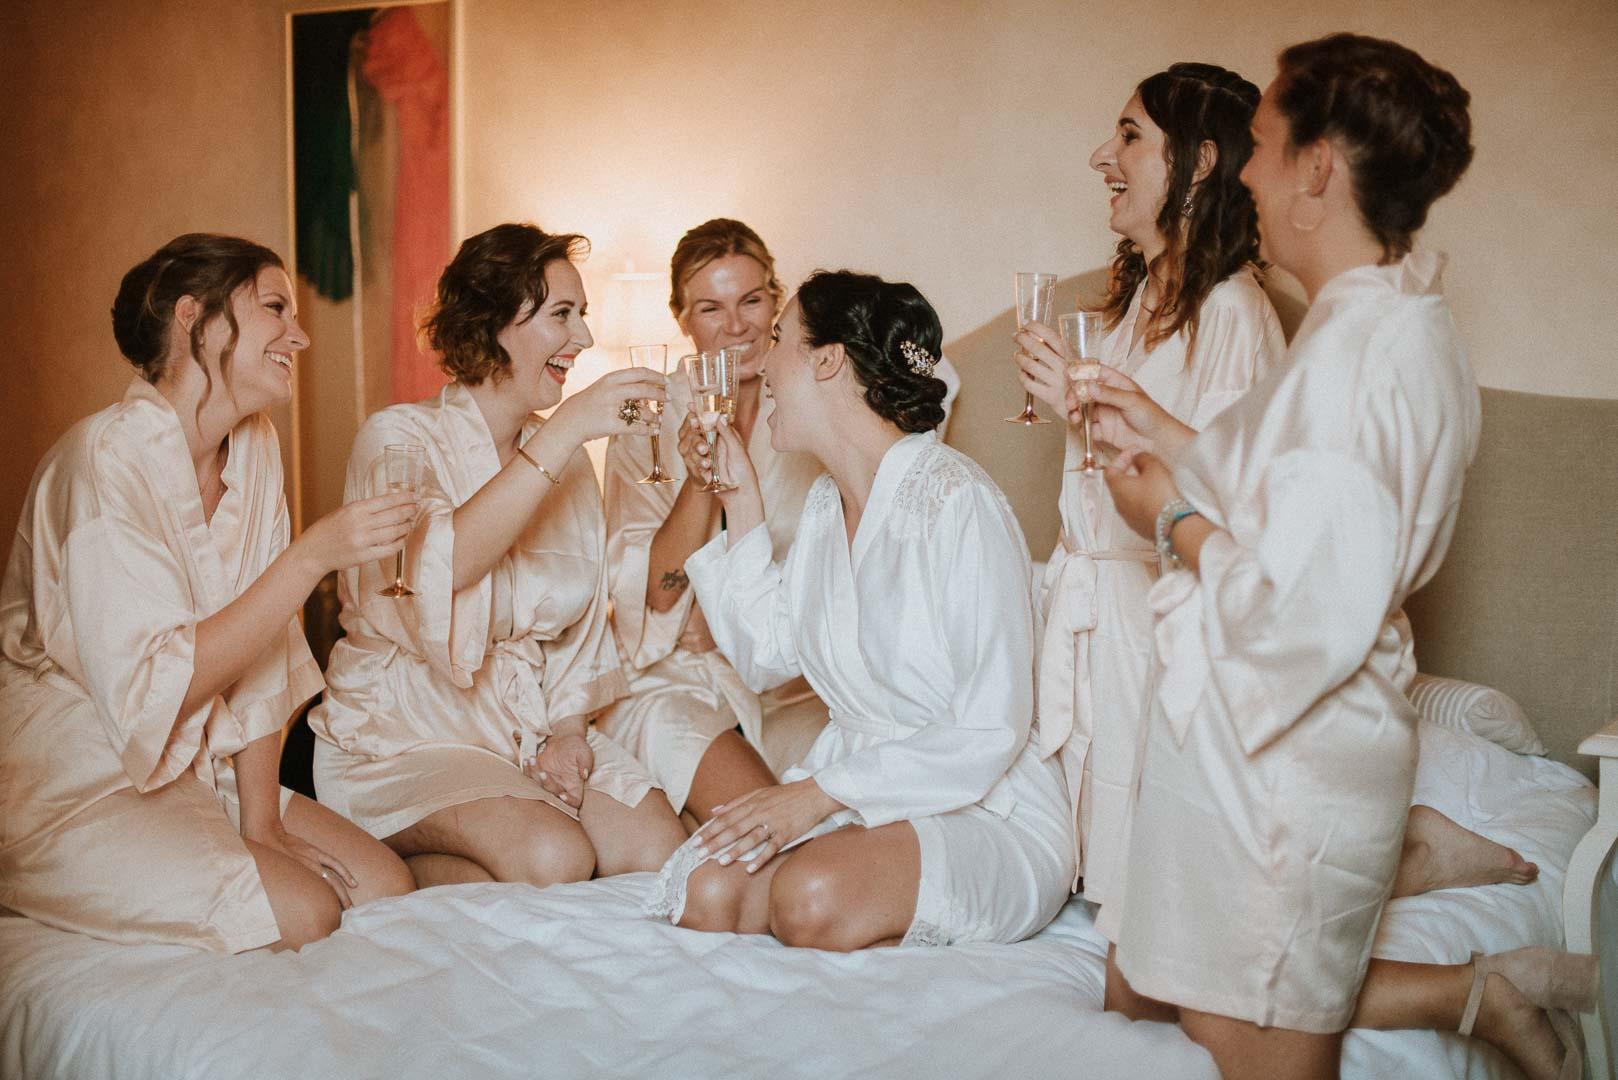 wedding-photographer-destination-fineart-bespoke-reportage-tuscany-villascorzi-vivianeizzo-spazio46-41